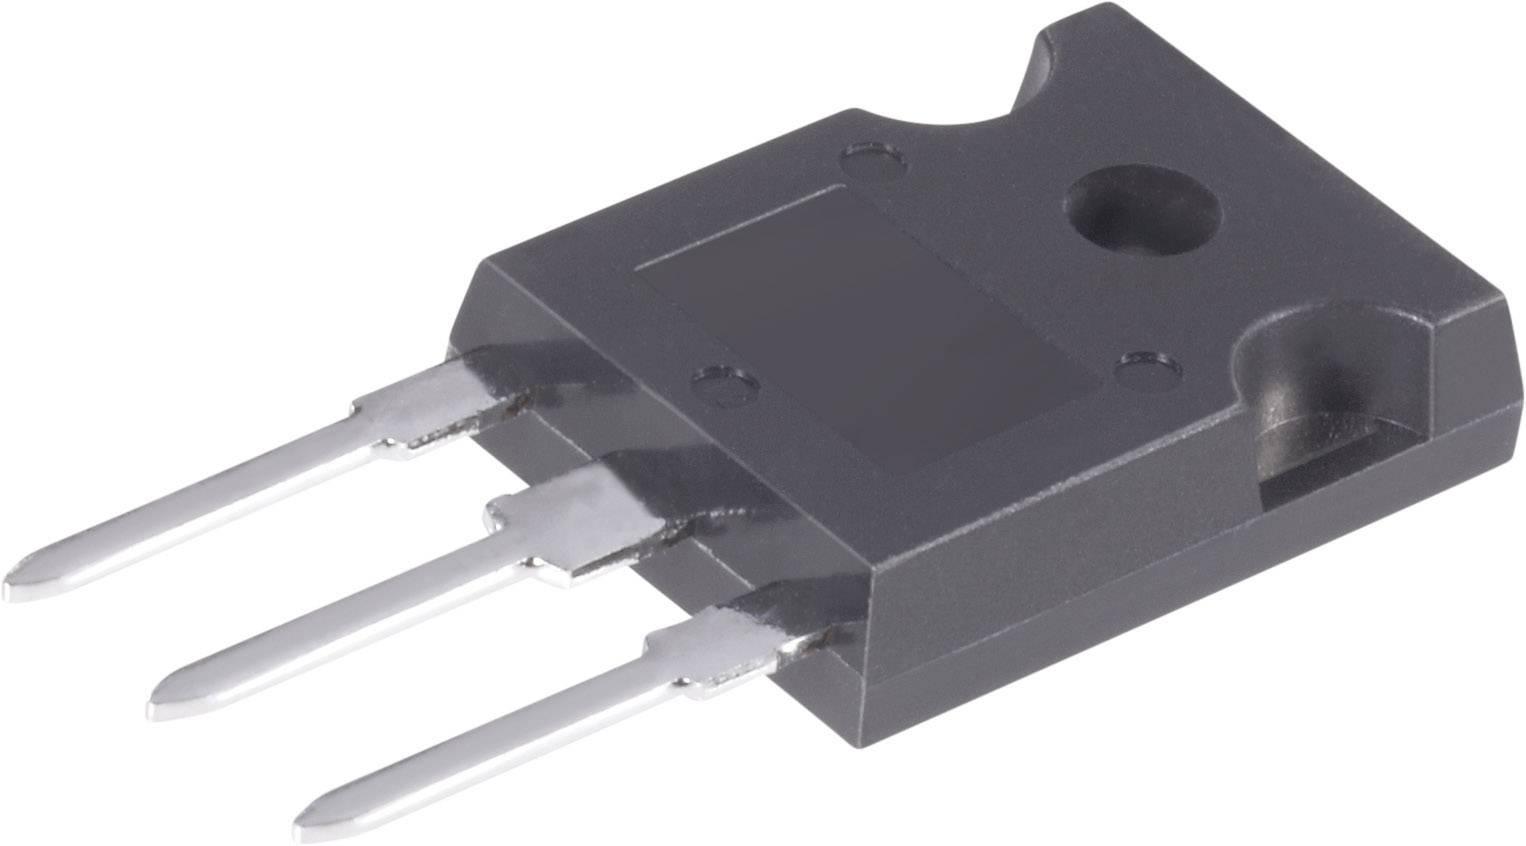 Tranzistor IGBT Infineon Technologies IRG4PH50SPBF, TO-247AC , 1200 V, samostatný, standardní